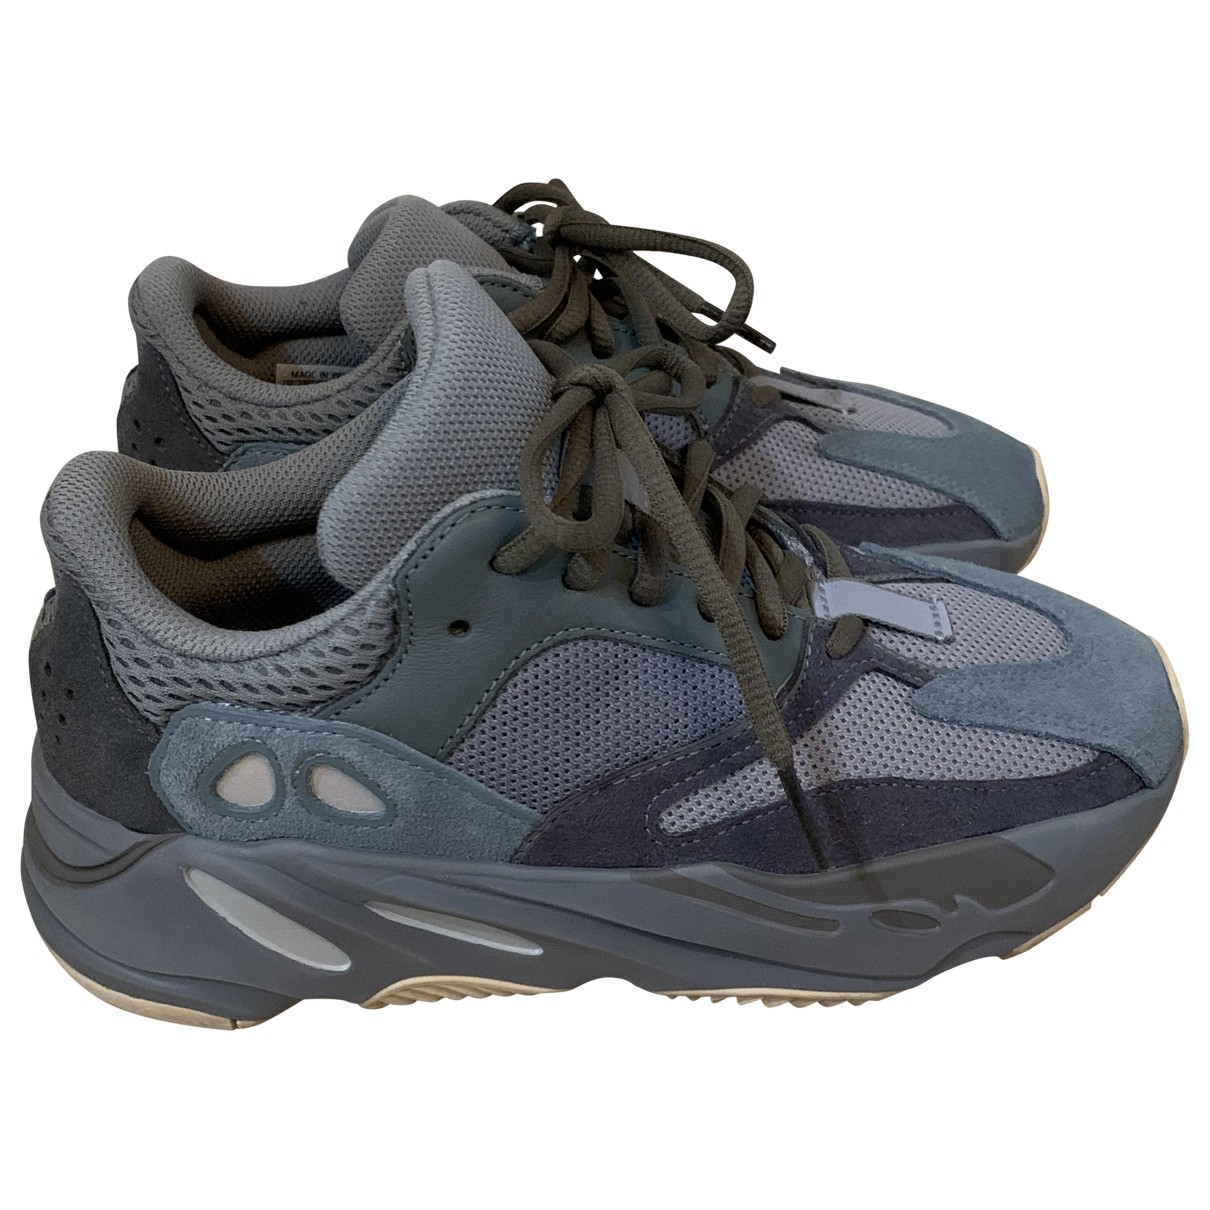 Yeezy X Adidas Boost 700 V3 Sneakers in  Blau Kautschuk